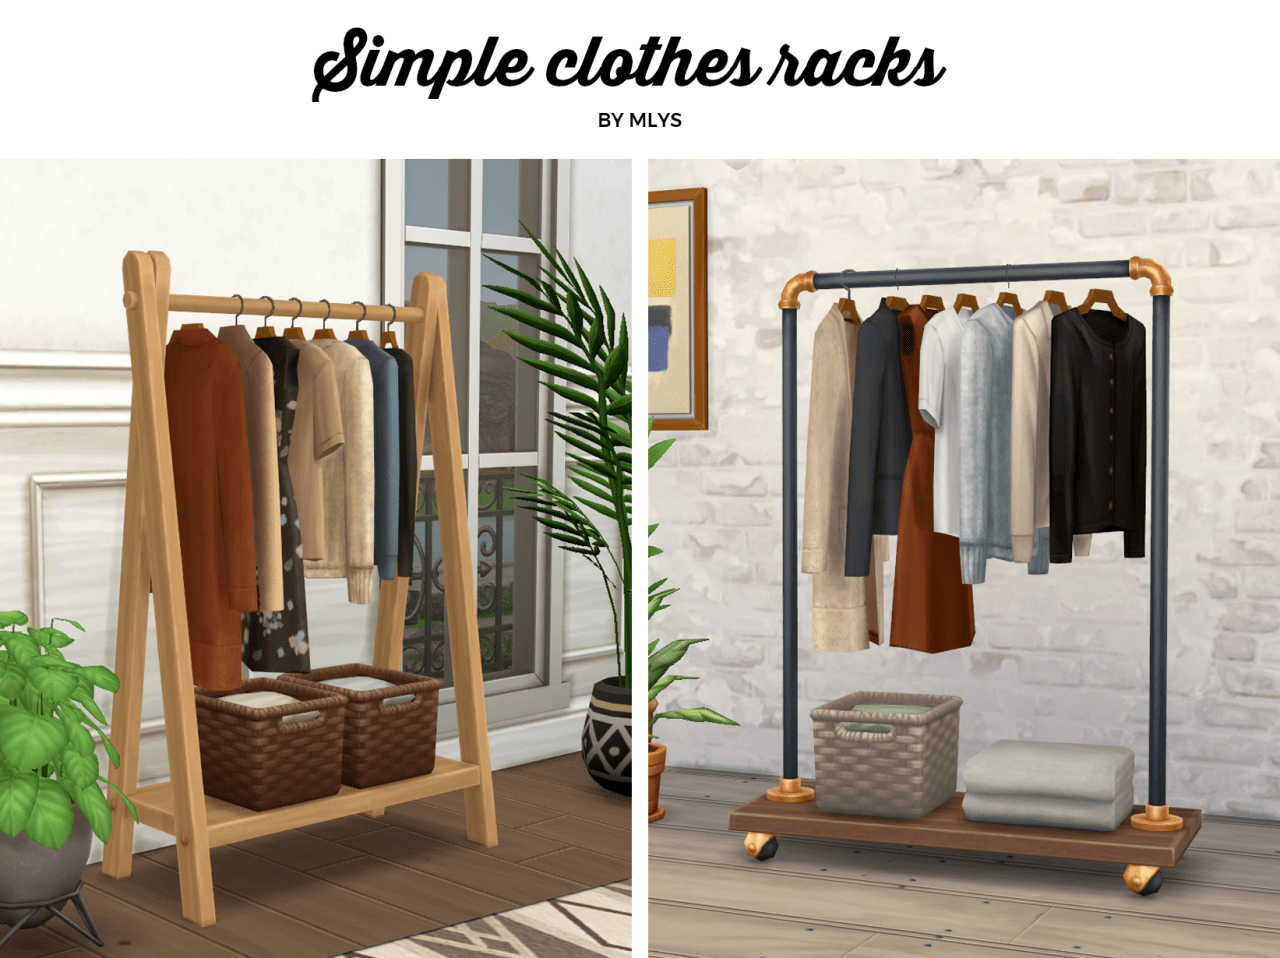 simple clothes racks